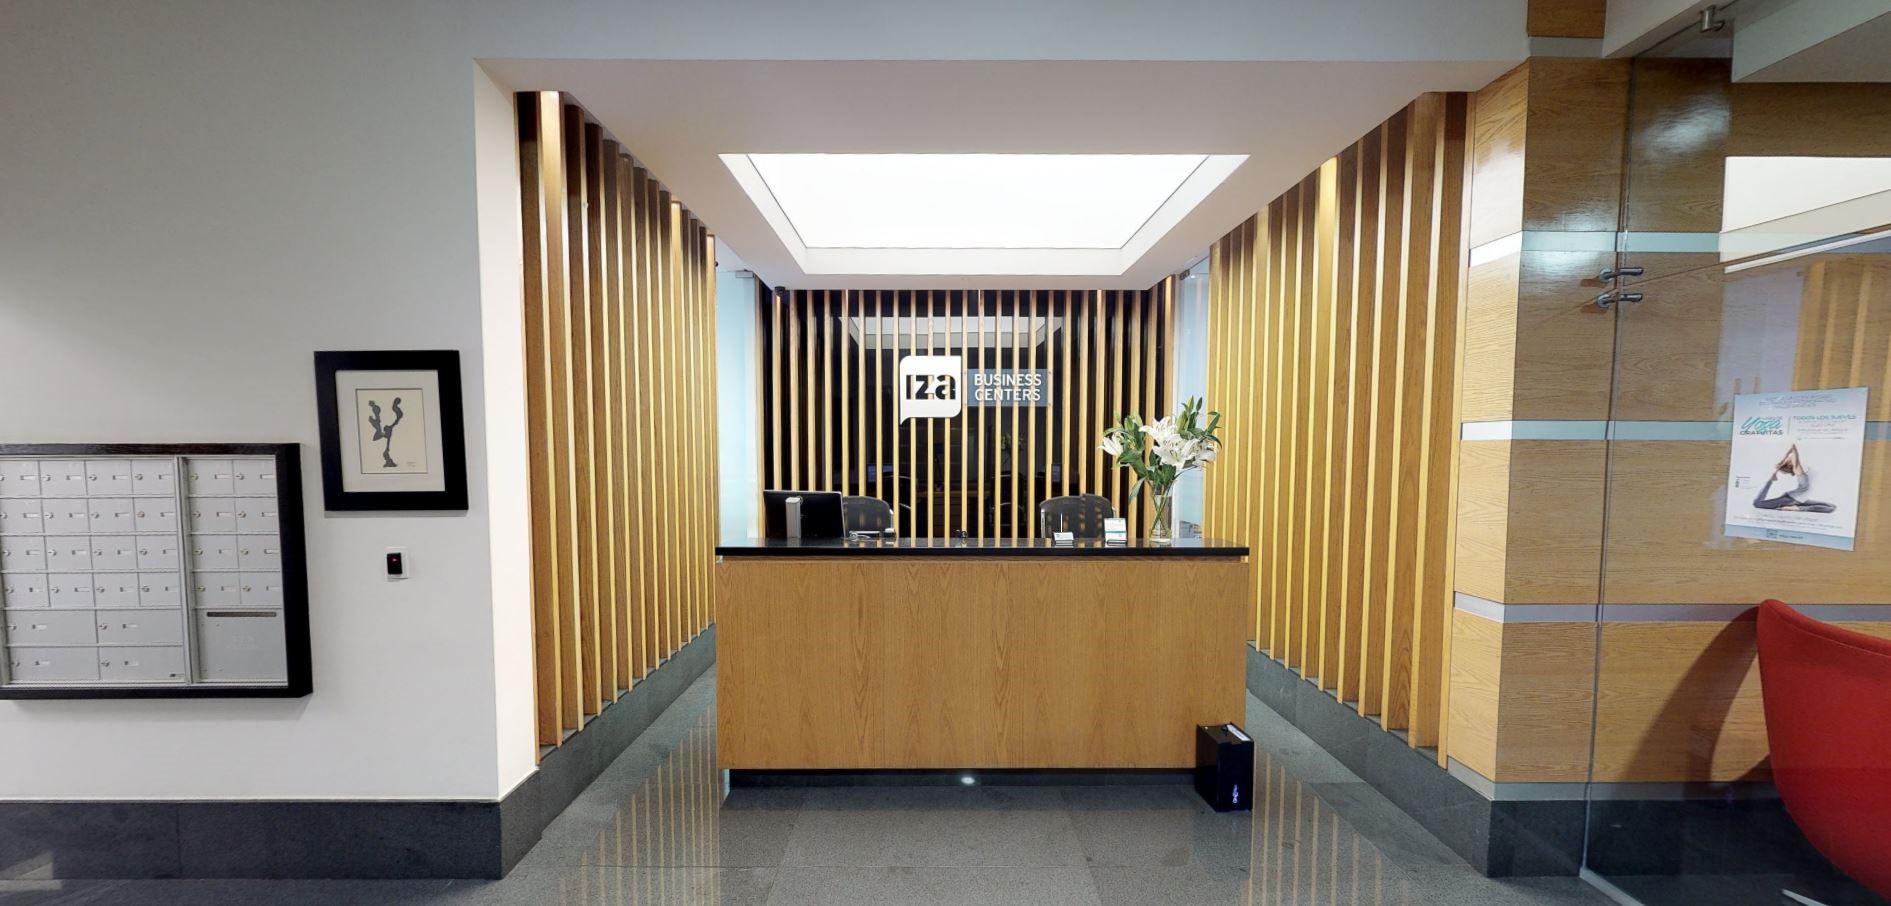 Monterrey (San Pedro) Live Receptionist and Business Address Lobby